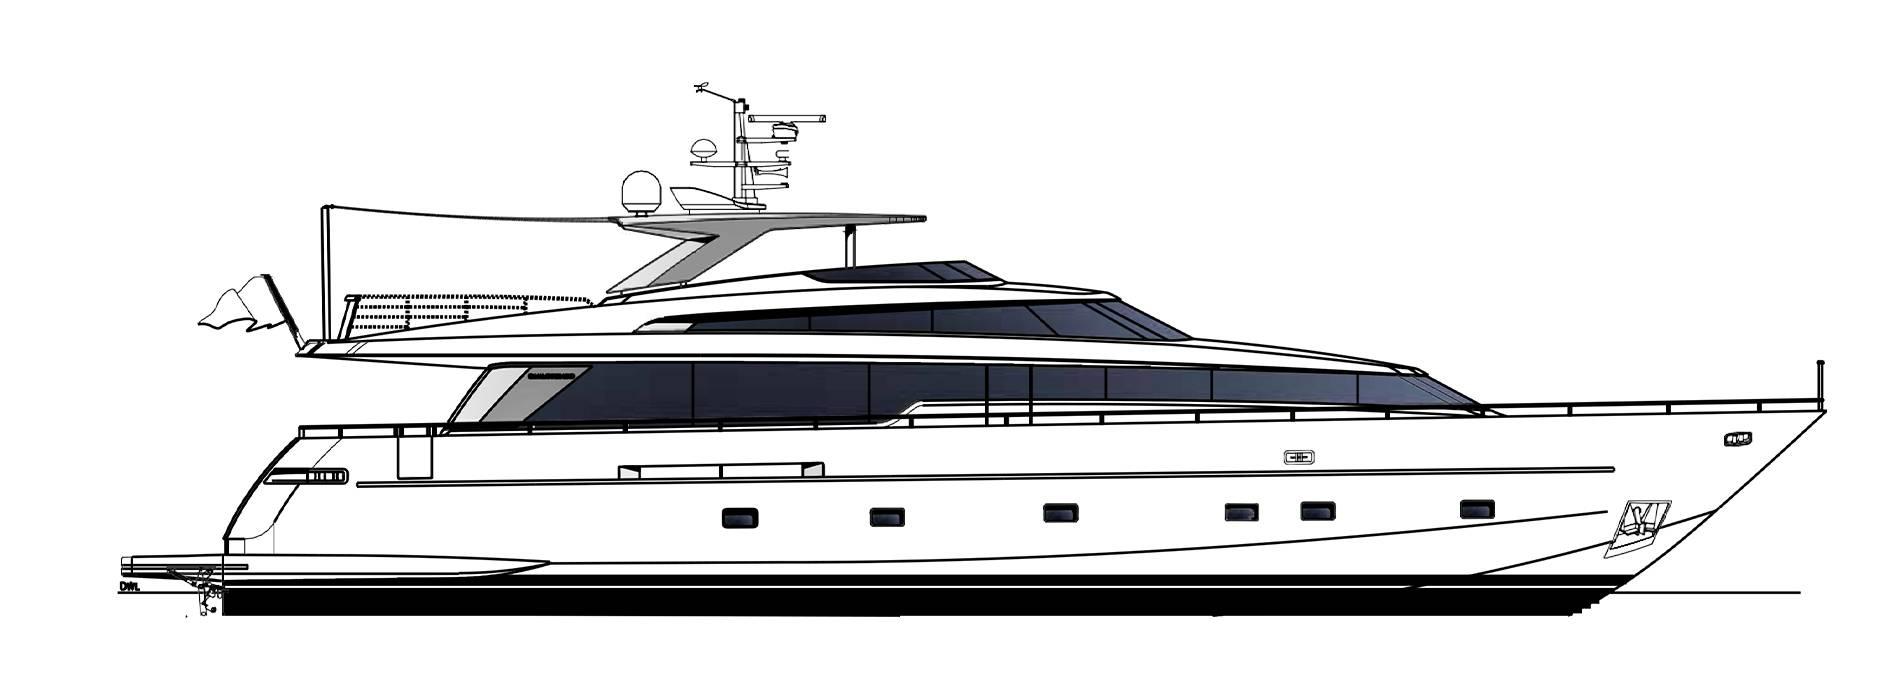 Sanlorenzo Yachts SL96-623 外观